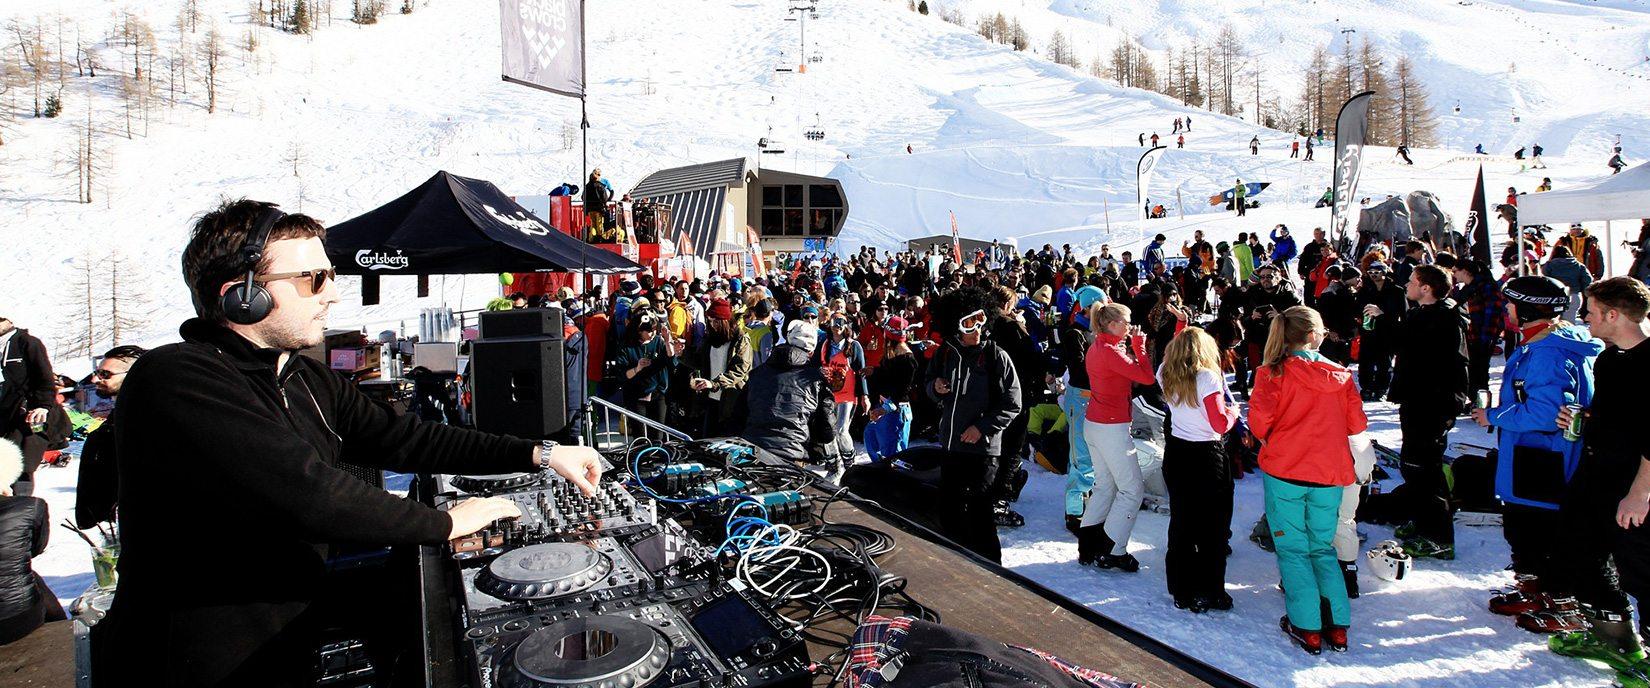 festival-station-ski-hiver-2016-2017